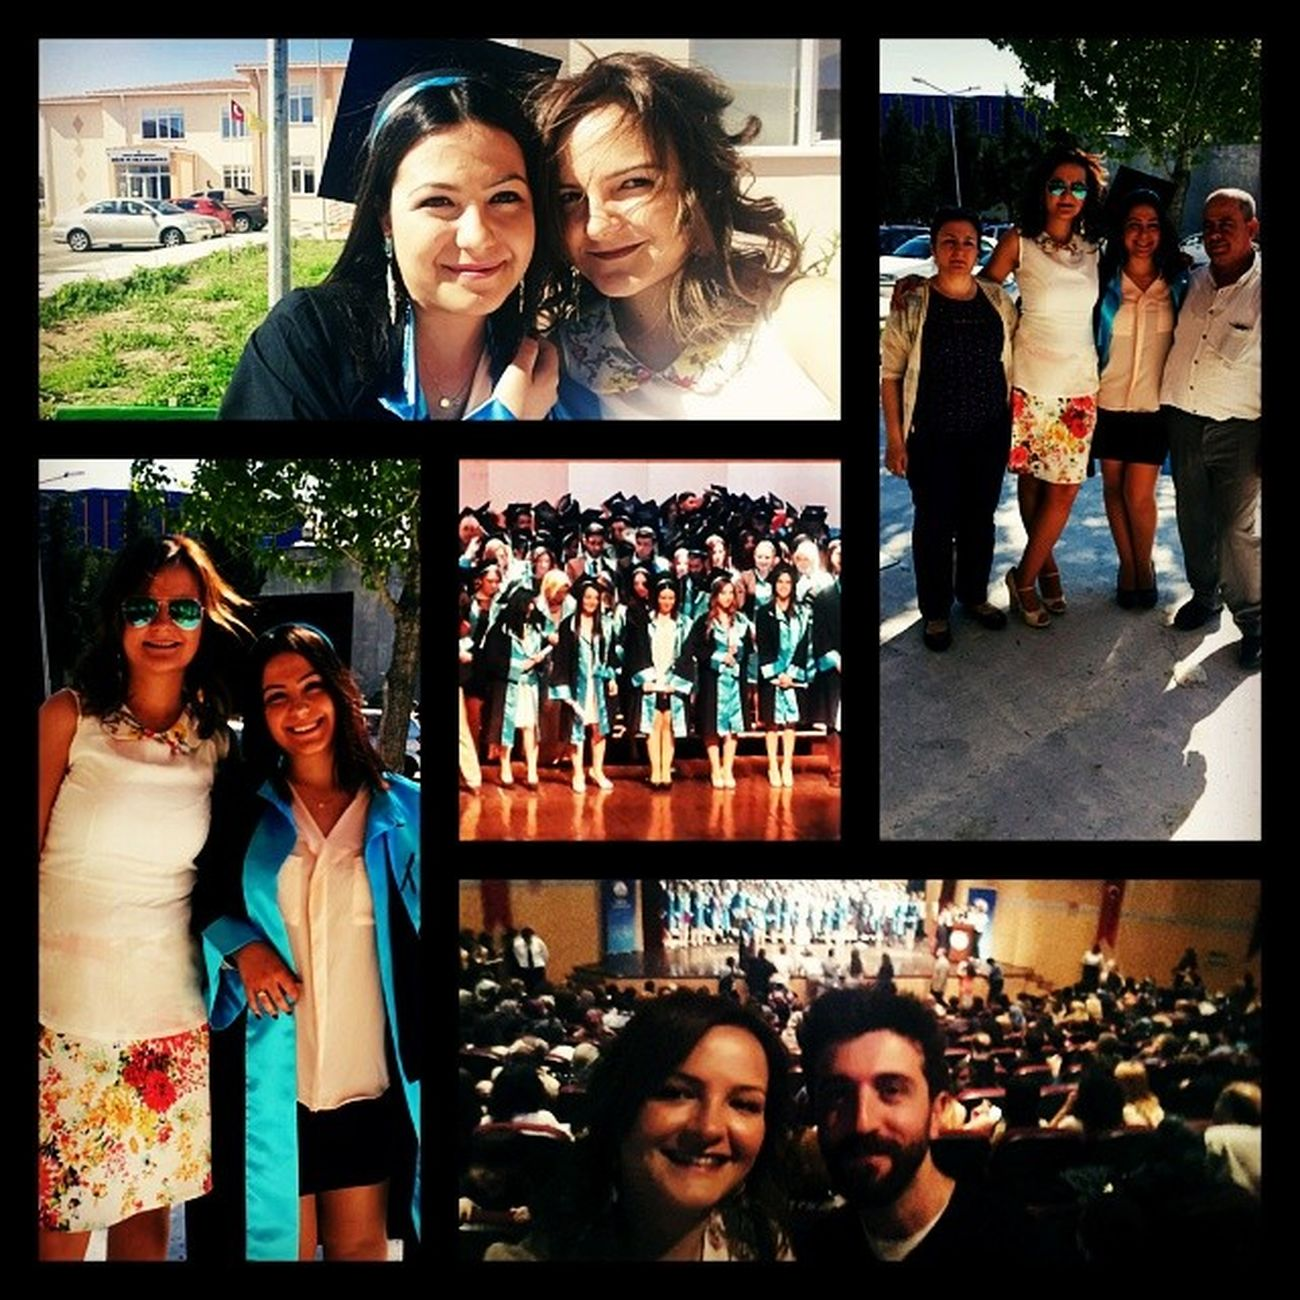 Birileri mezun oldu. Heysista Trakyauni Mimariresto